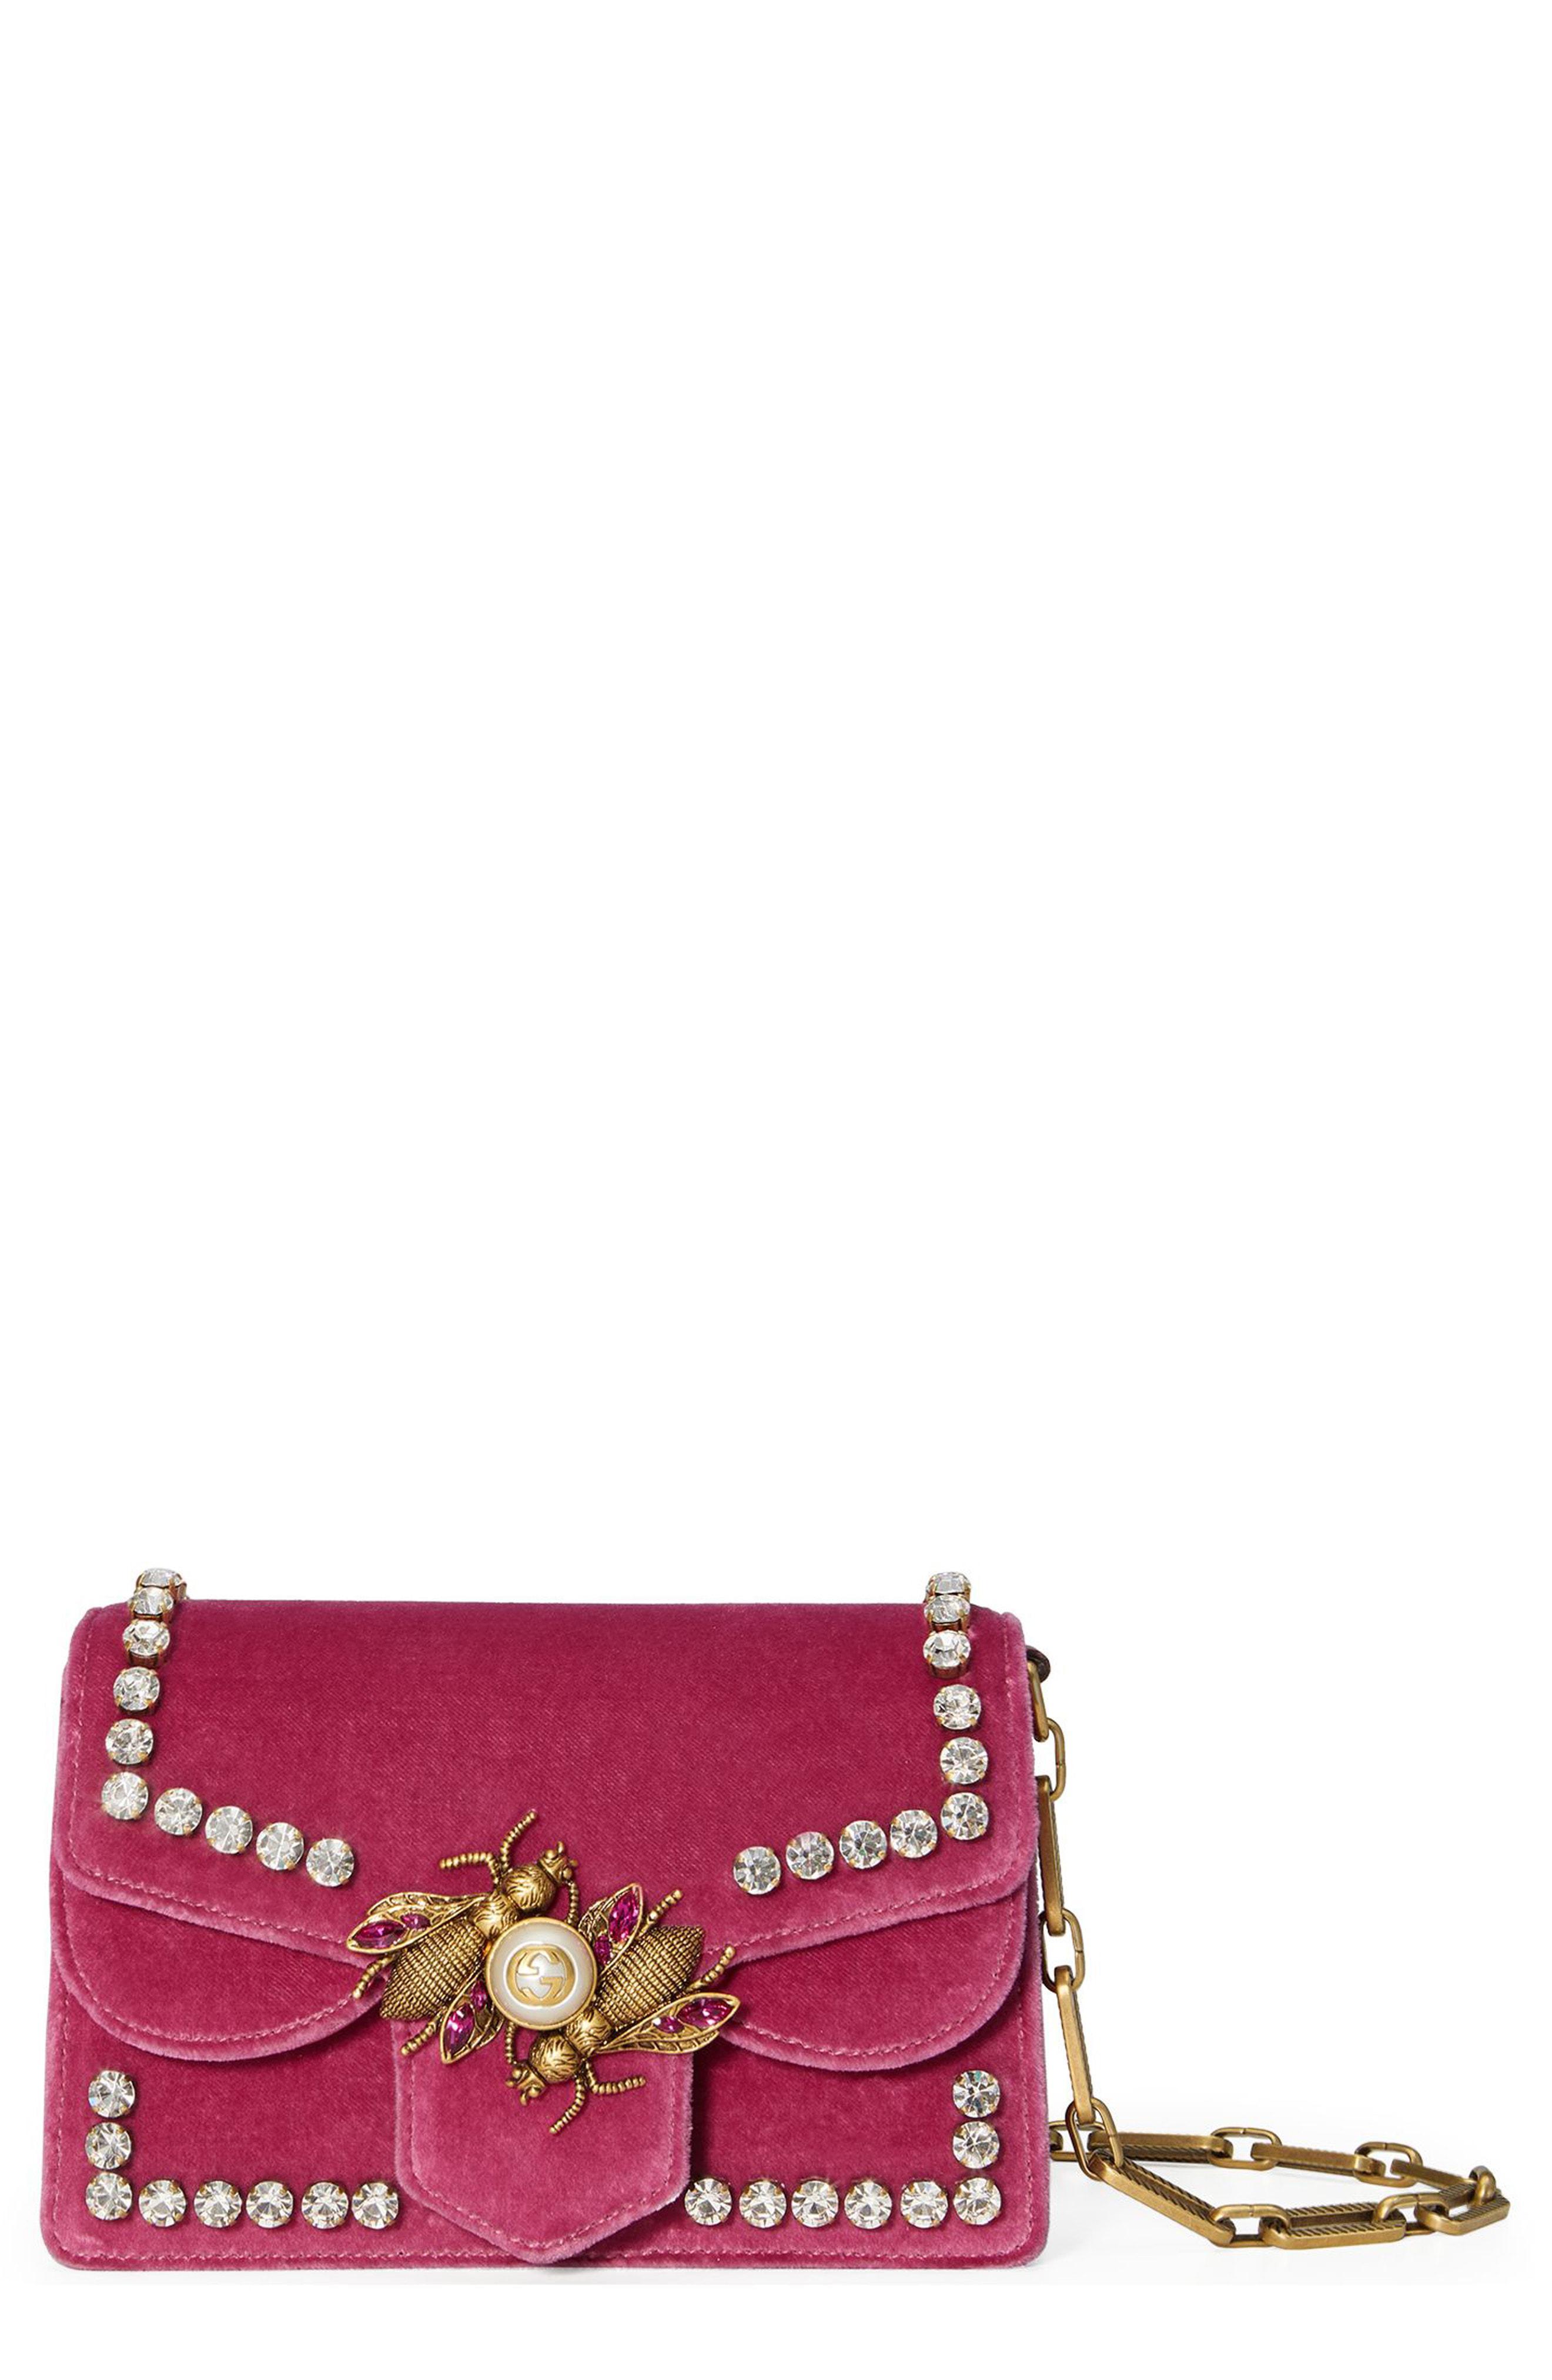 Lyst - Gucci Broadway Bee Velvet Shoulder Bag in Pink 2c3b173bf47e2